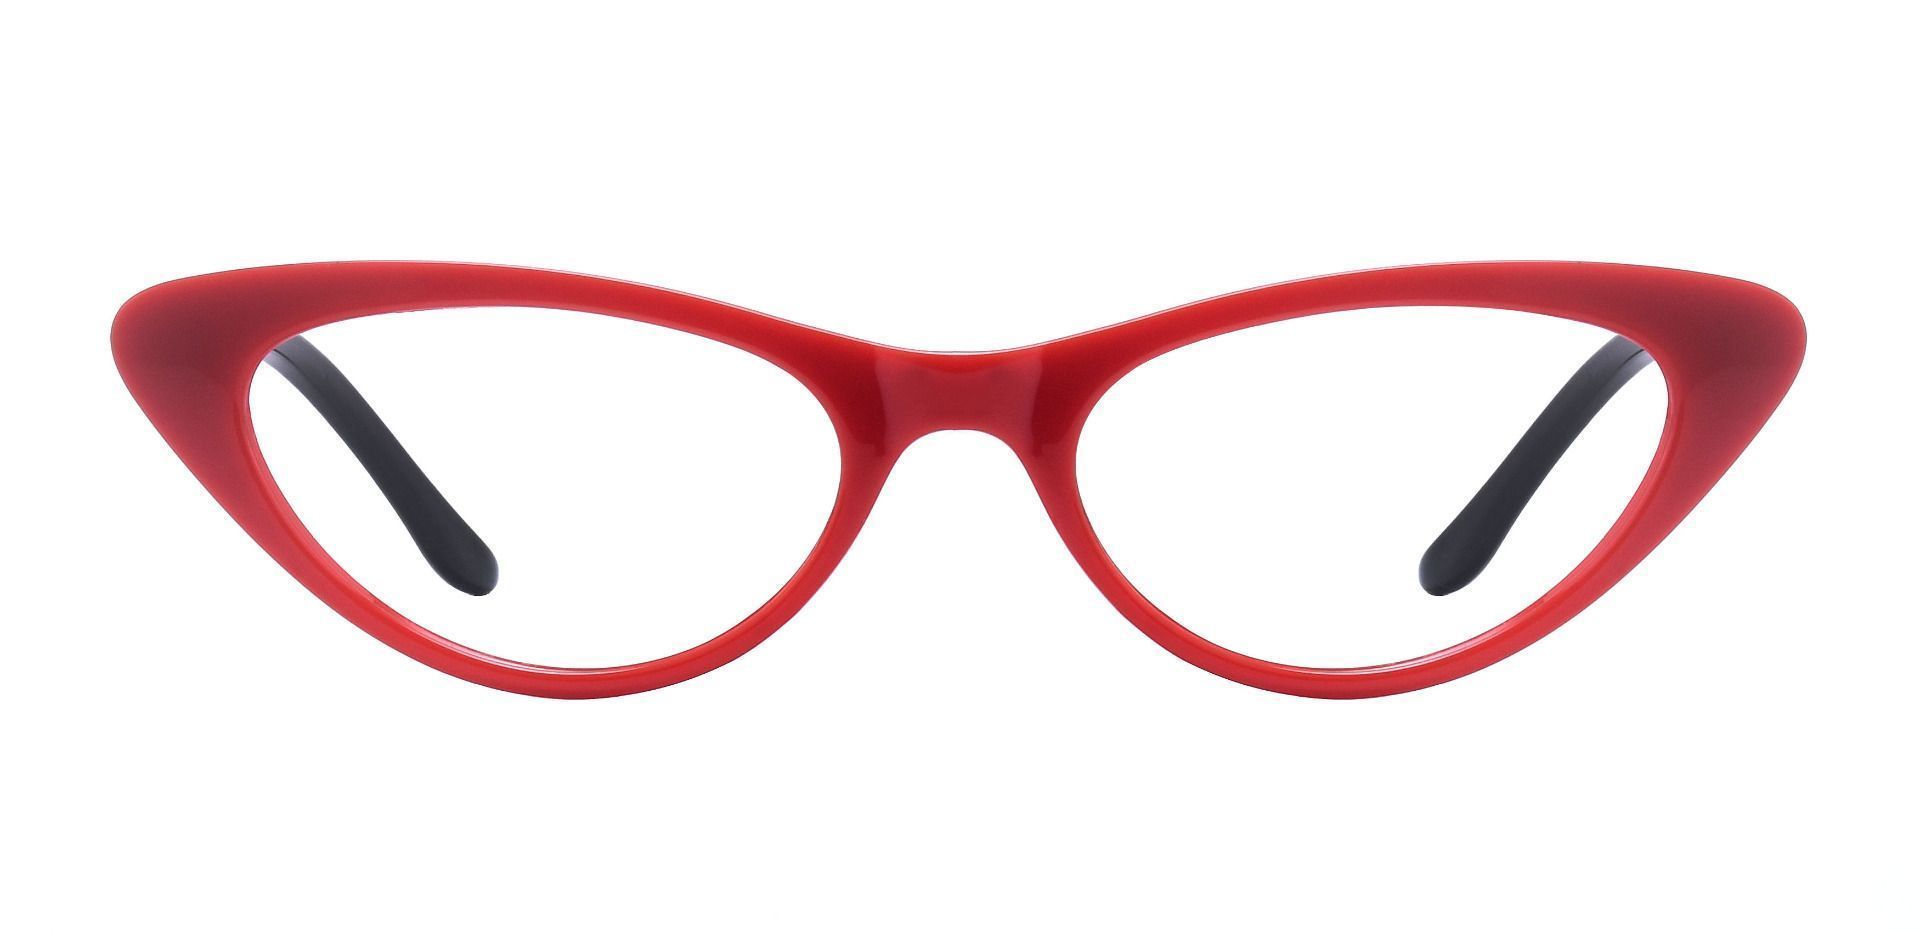 Sassy Cat-Eye Prescription Glasses - Red